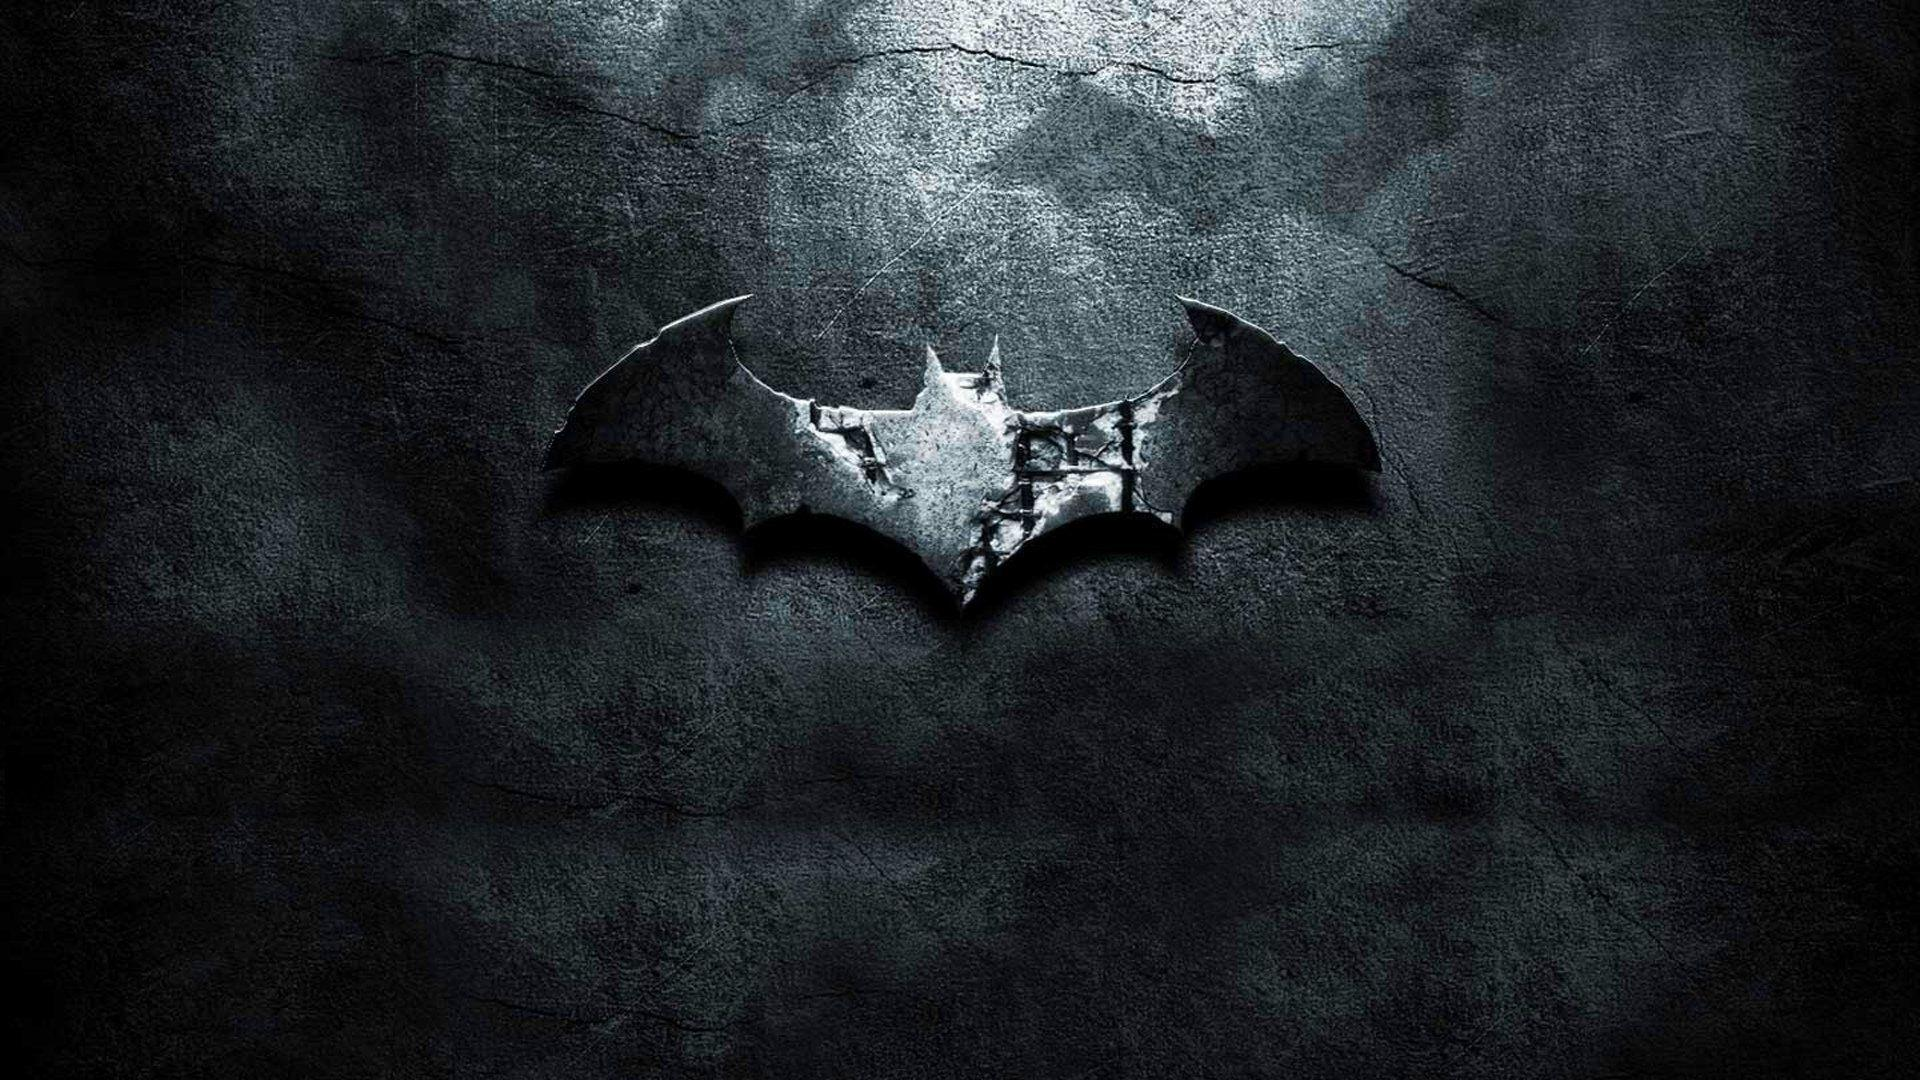 Top Anime Wallpaper Batman Backgrounds 14926 Hdwpro